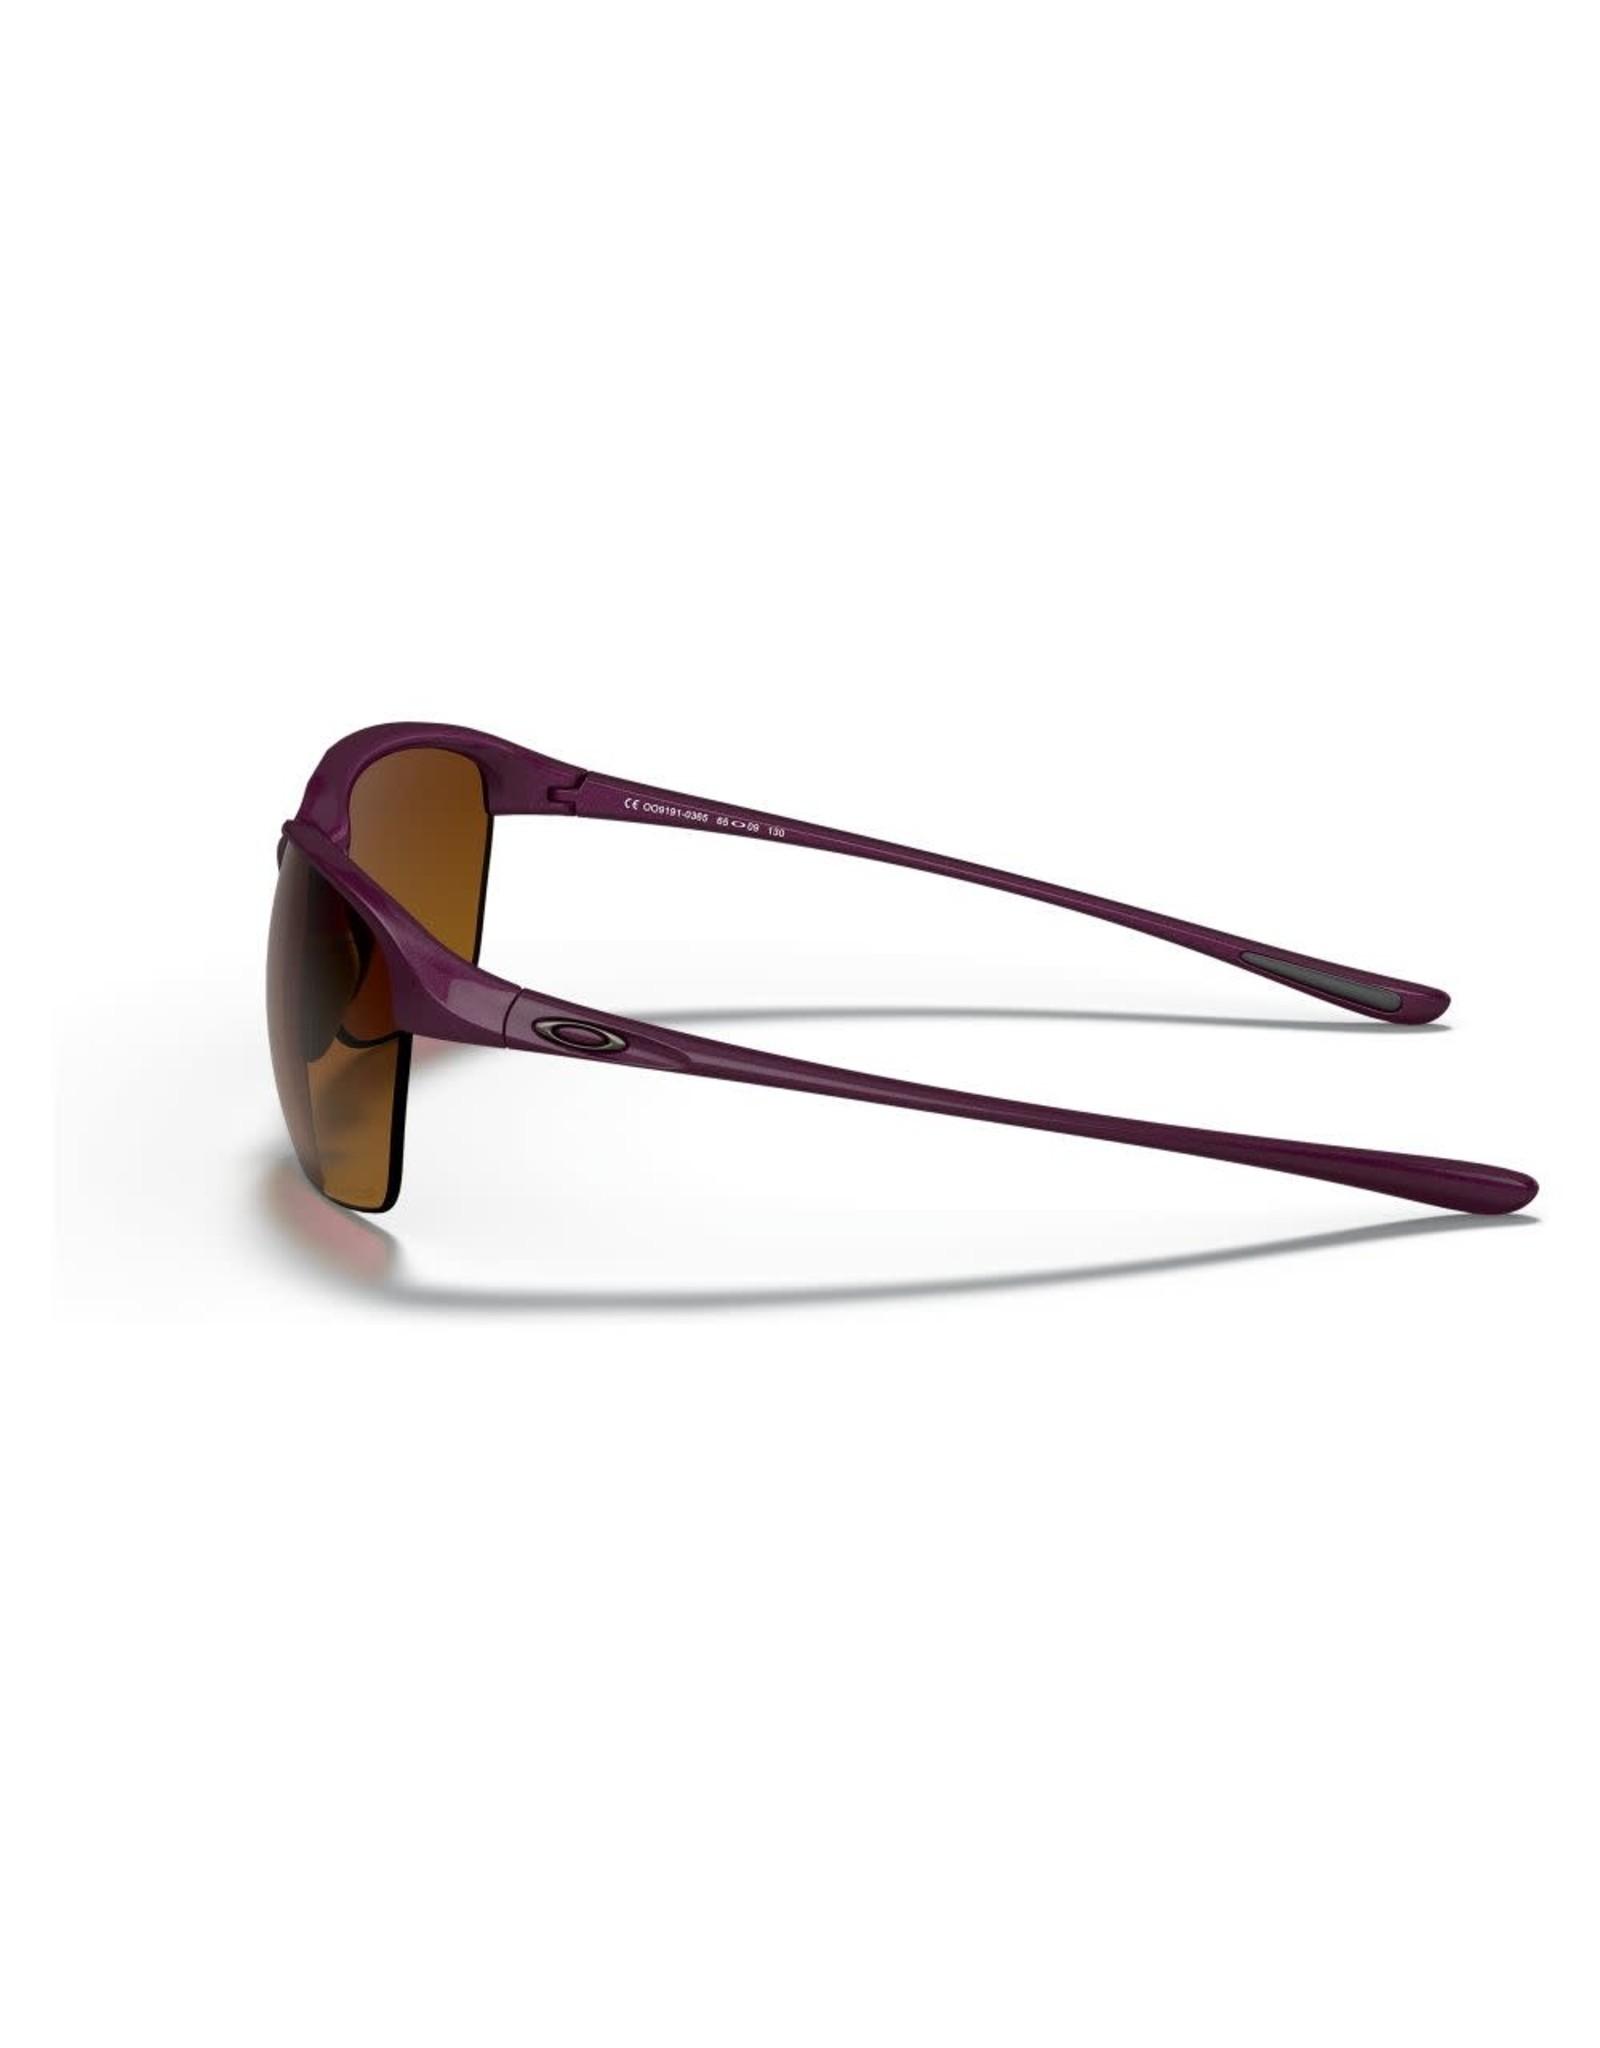 OAKLEY Oakley Unstoppable raspberry spritzer brown gradient polarized sunglasses